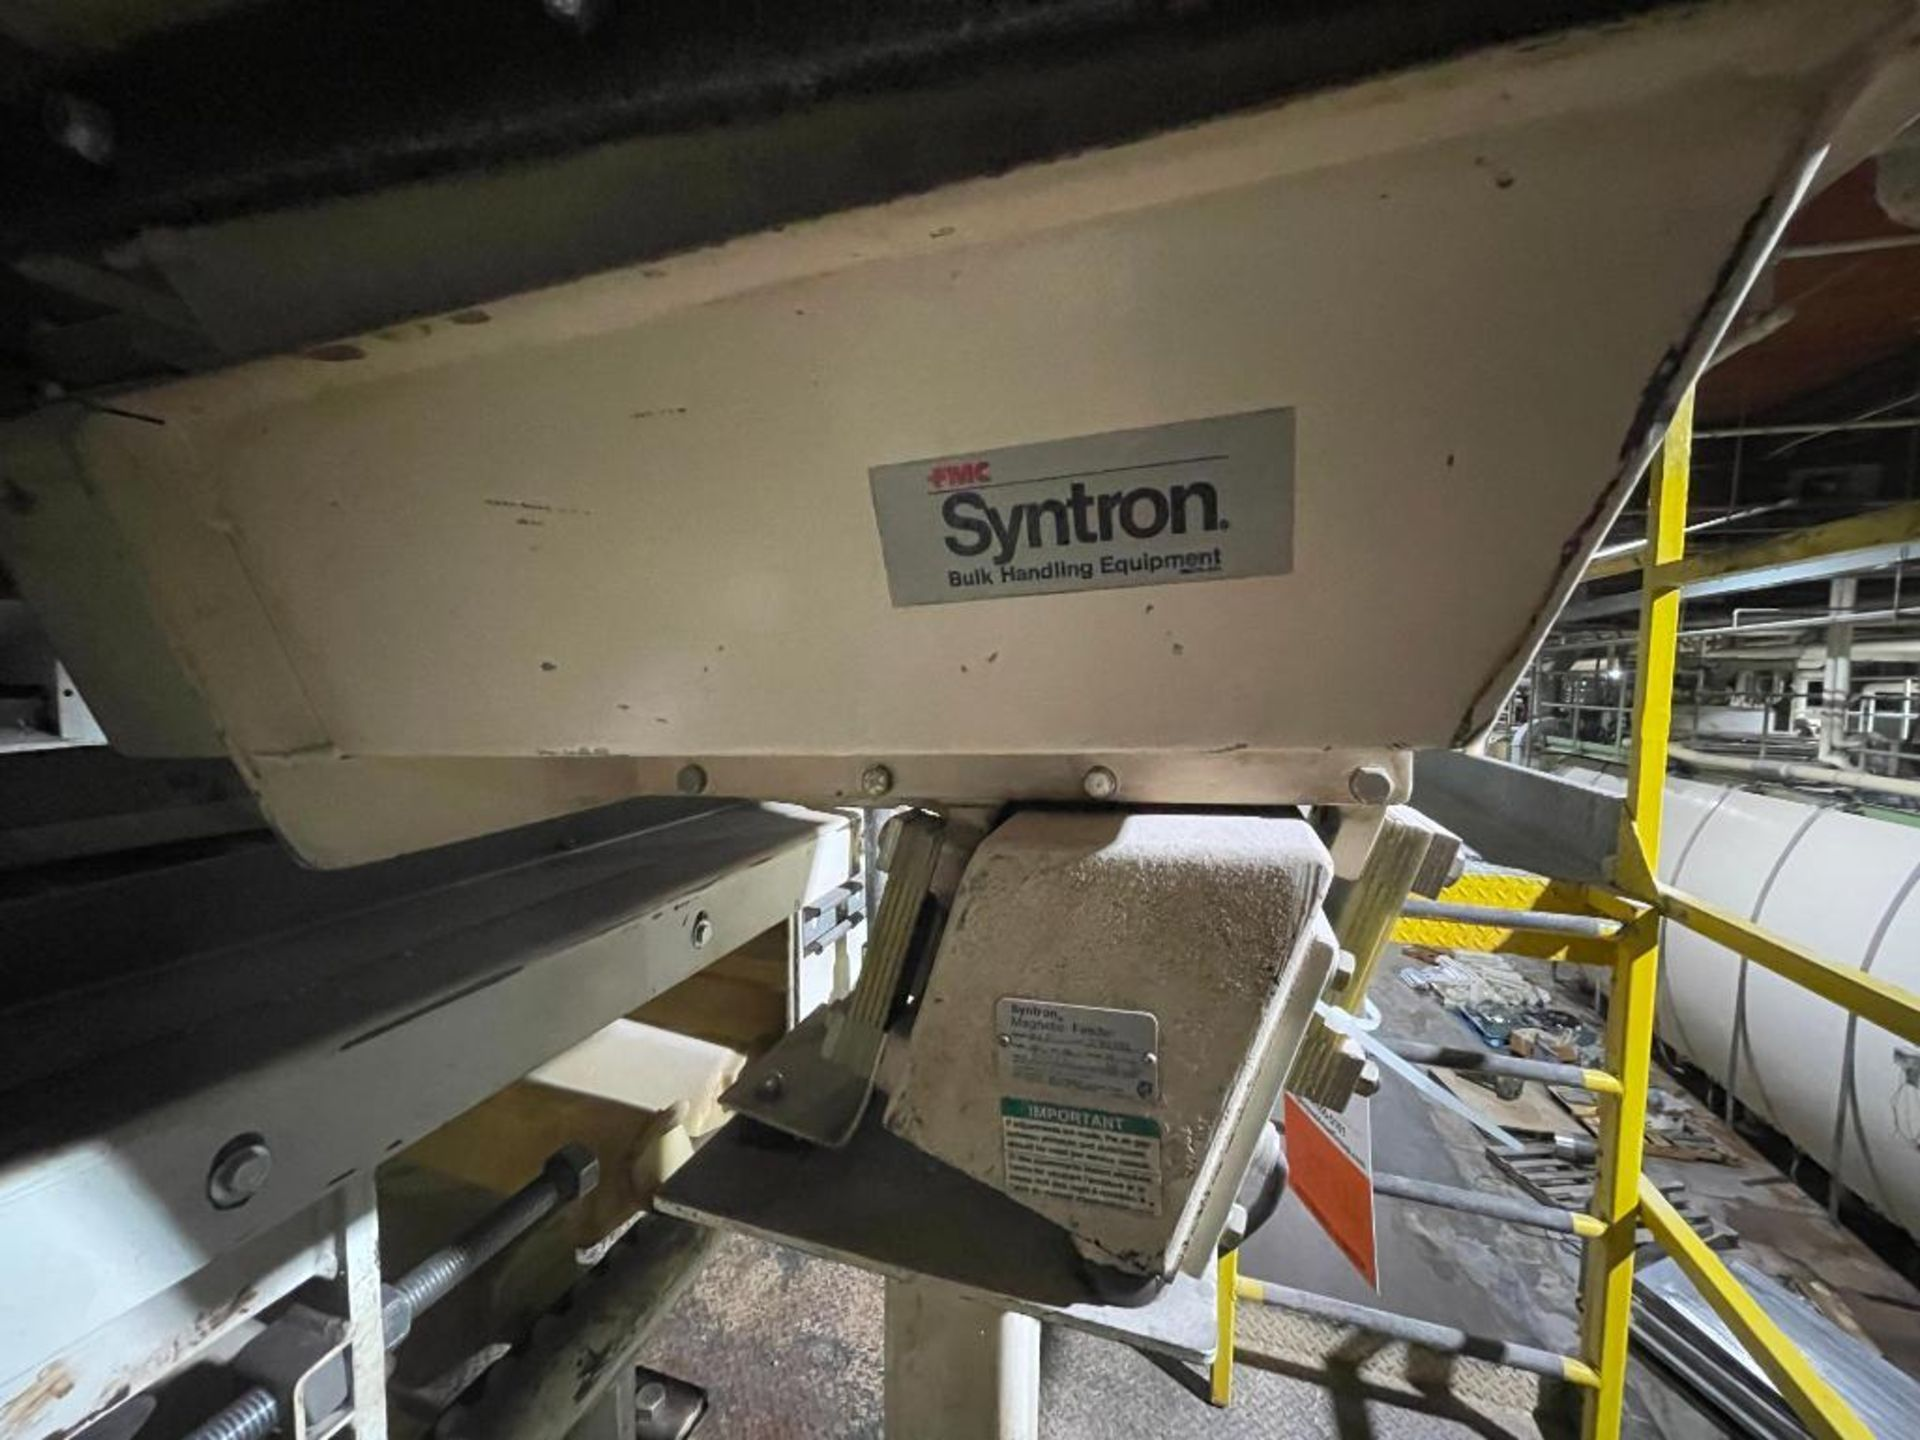 Syntron vibratory feeder - Image 2 of 4